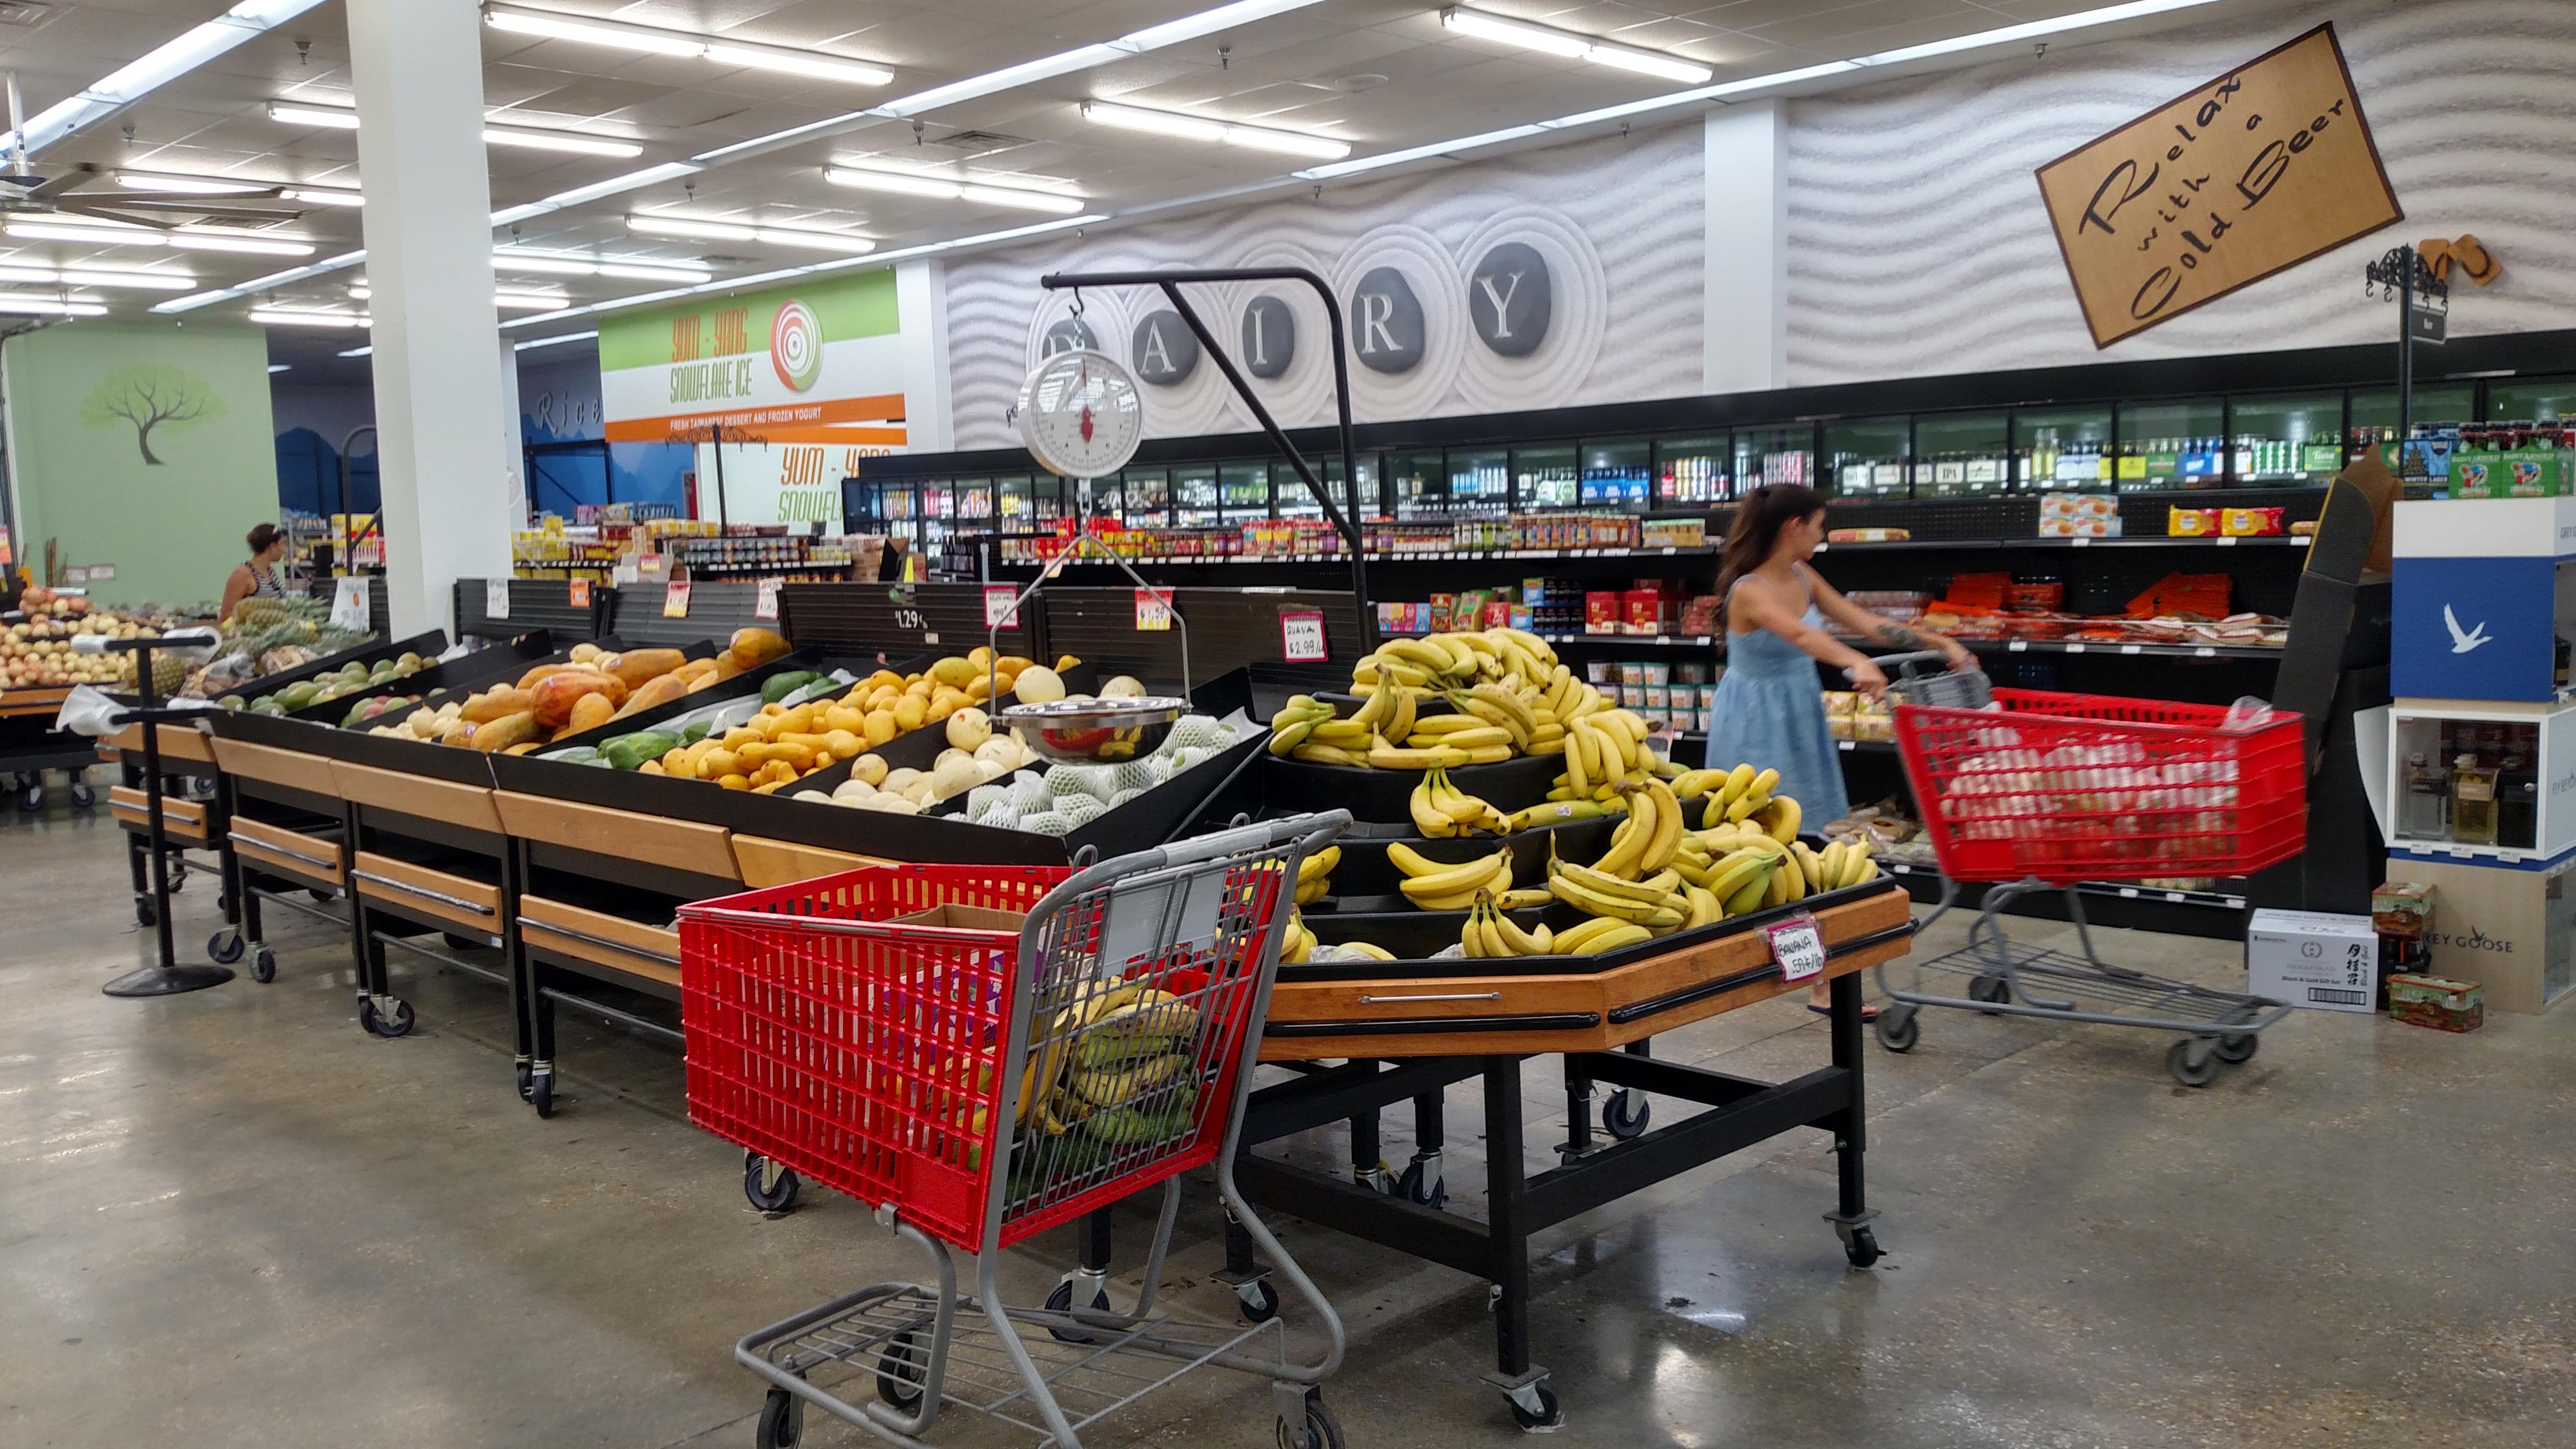 Asian Markets in NOLA